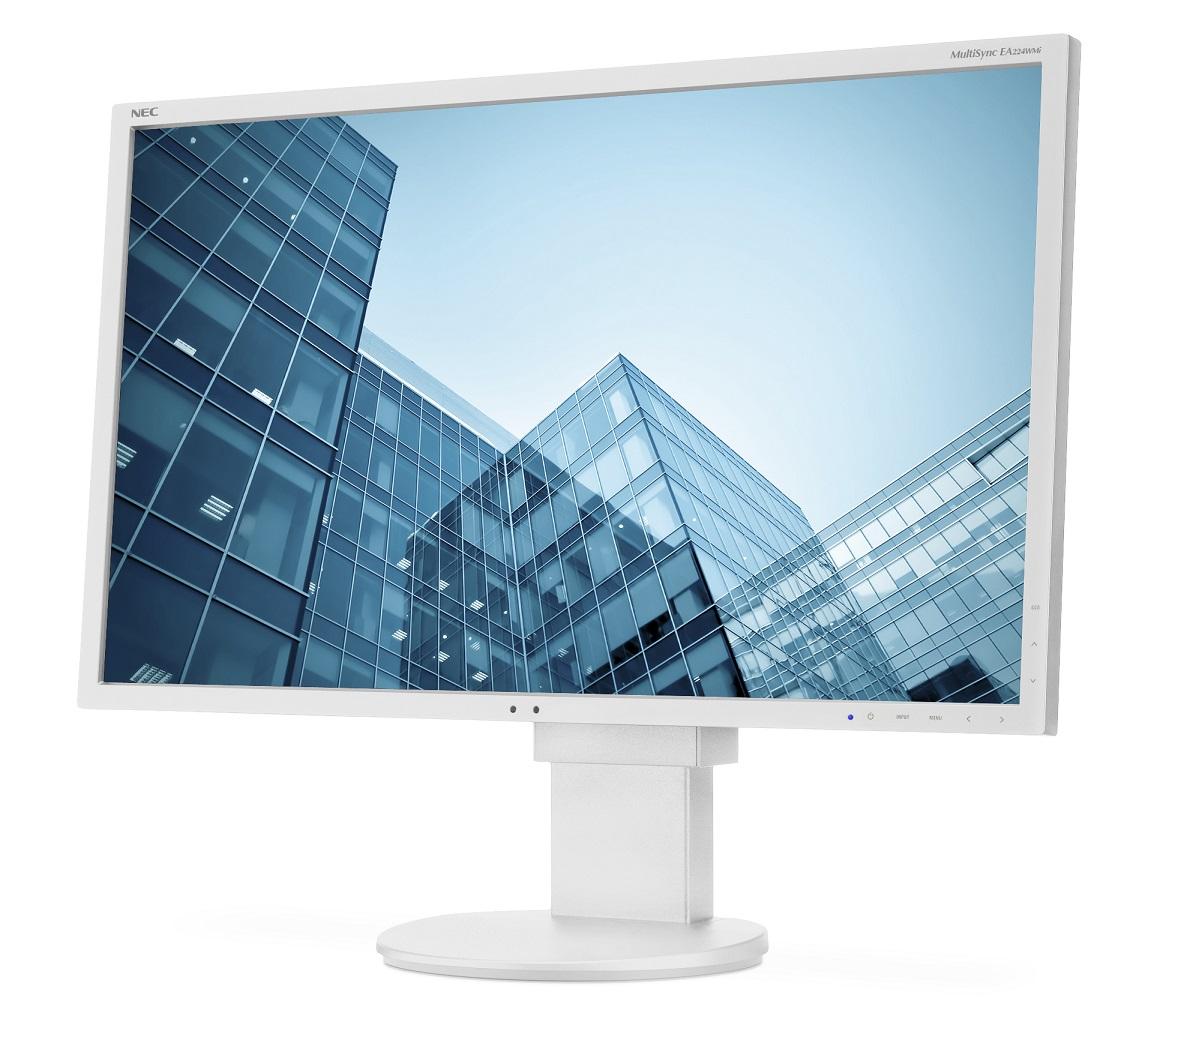 22' LED NEC EA224WMi - FullHD,IPS,DP,USB,piv,r,wh